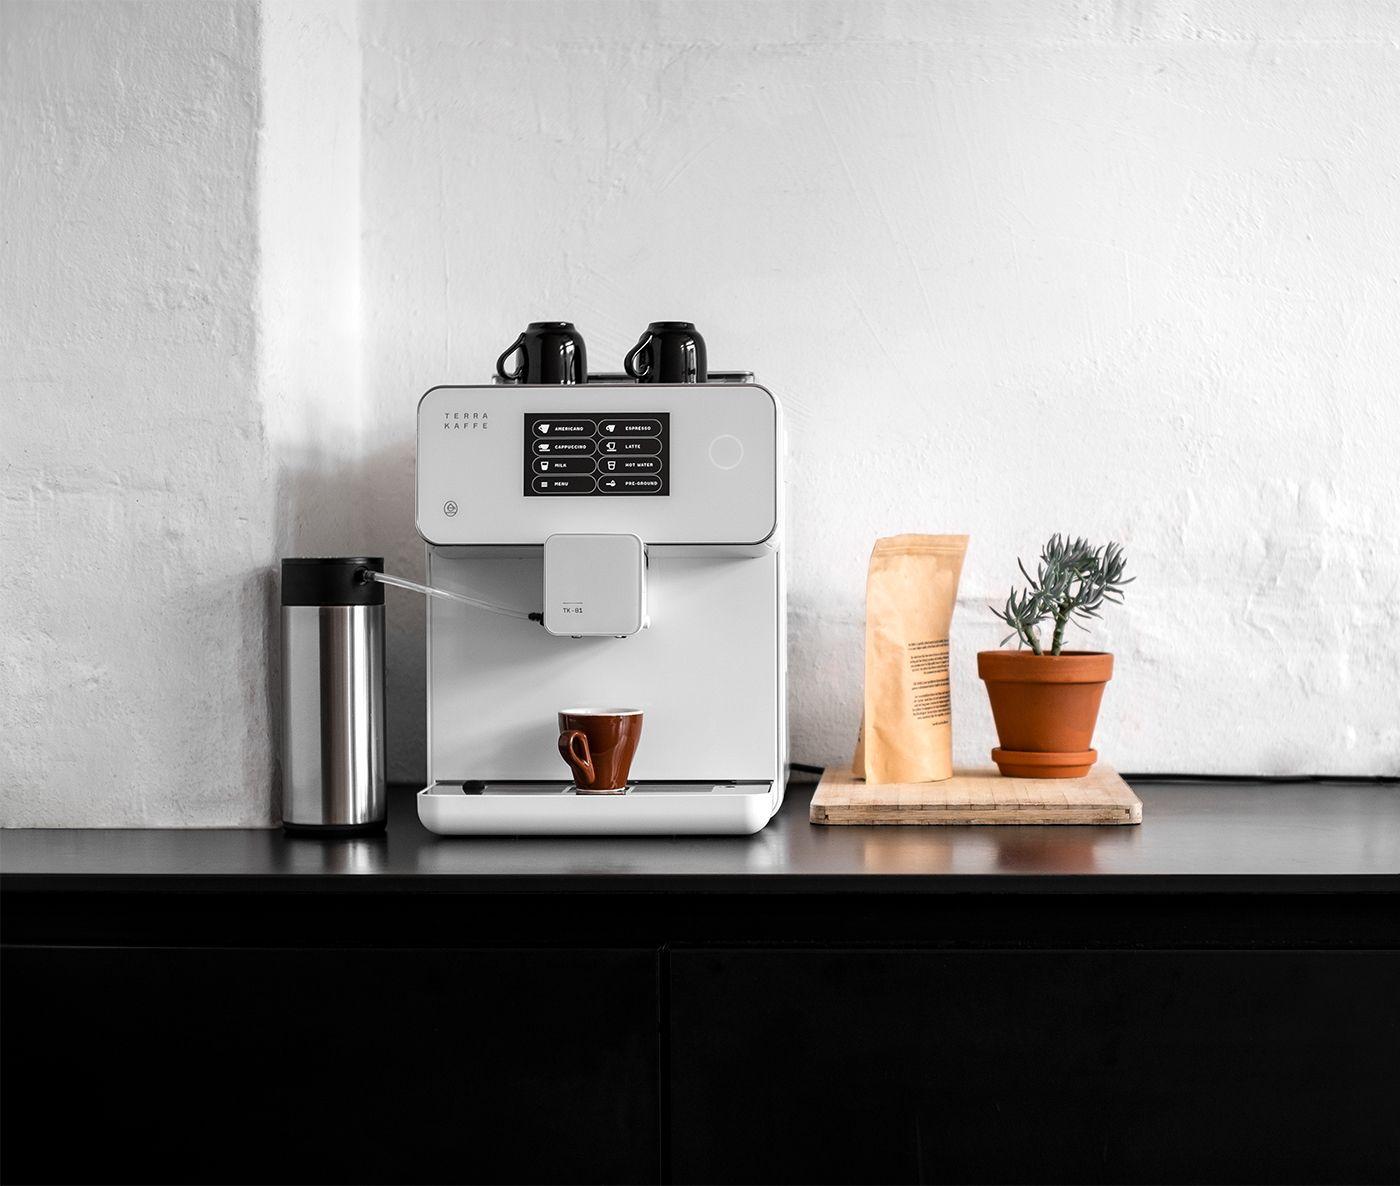 Tk 01 In 2020 Home Espresso Machine Coffee Machine Design Espresso Machine